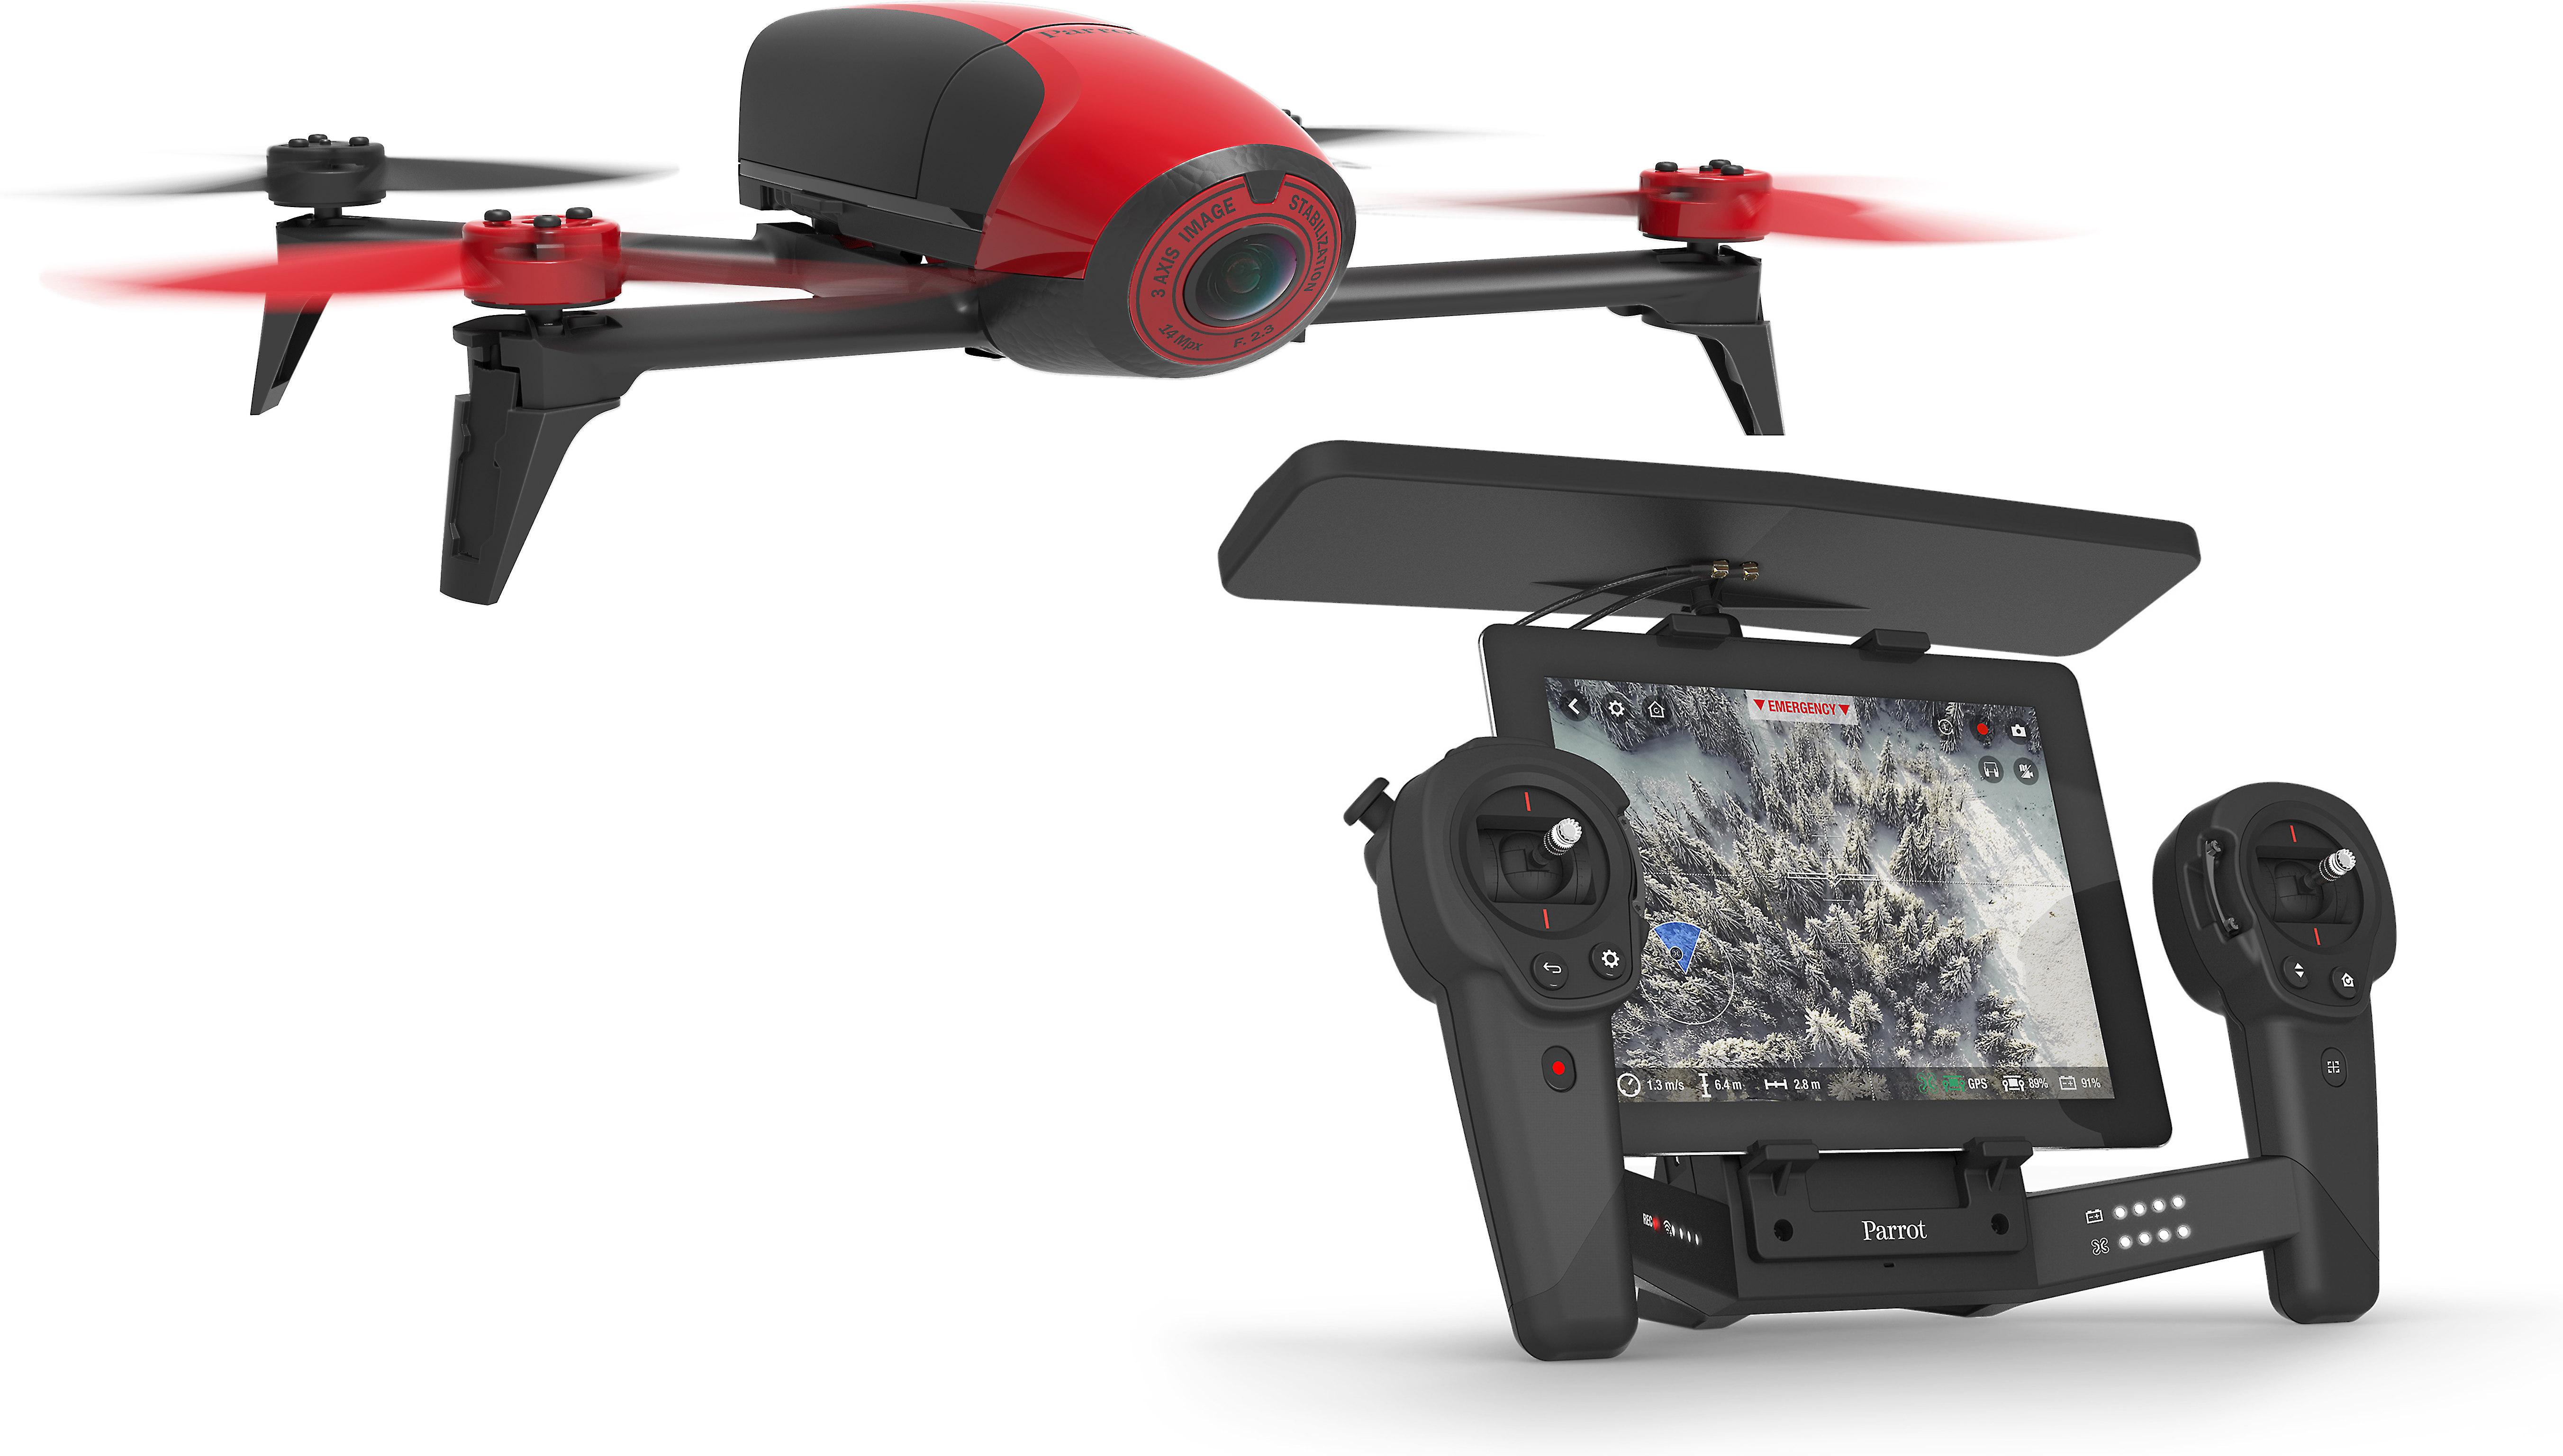 Parrot Bebop 2 Drone and Skycontroller Black Bundle (Red/Black)